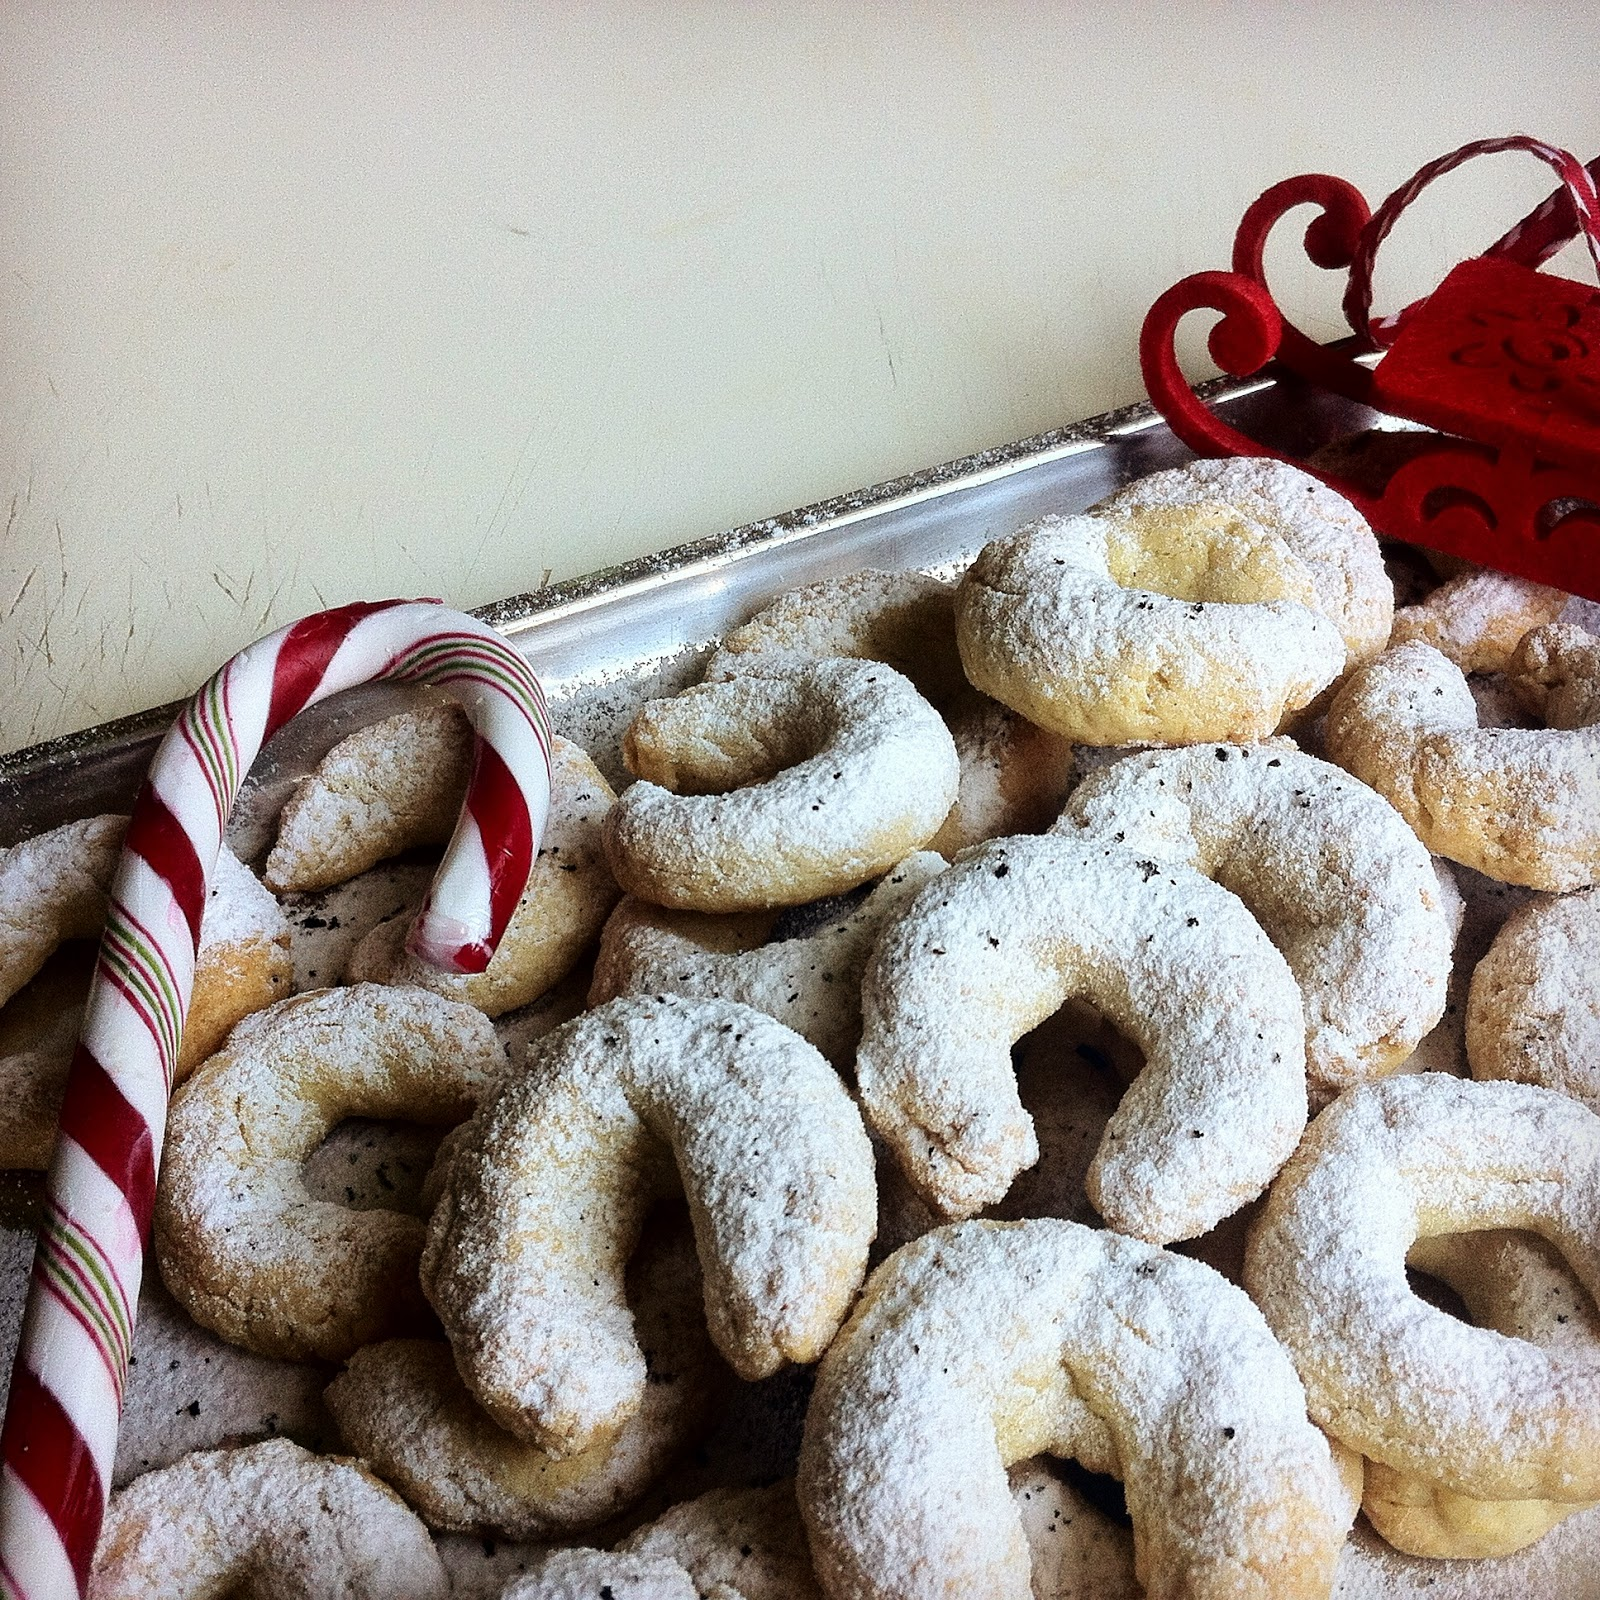 Dolci Di Natale Austriaci.Vanillekipferl Biscotti Natalizi Alla Vaniglia Dall Austria